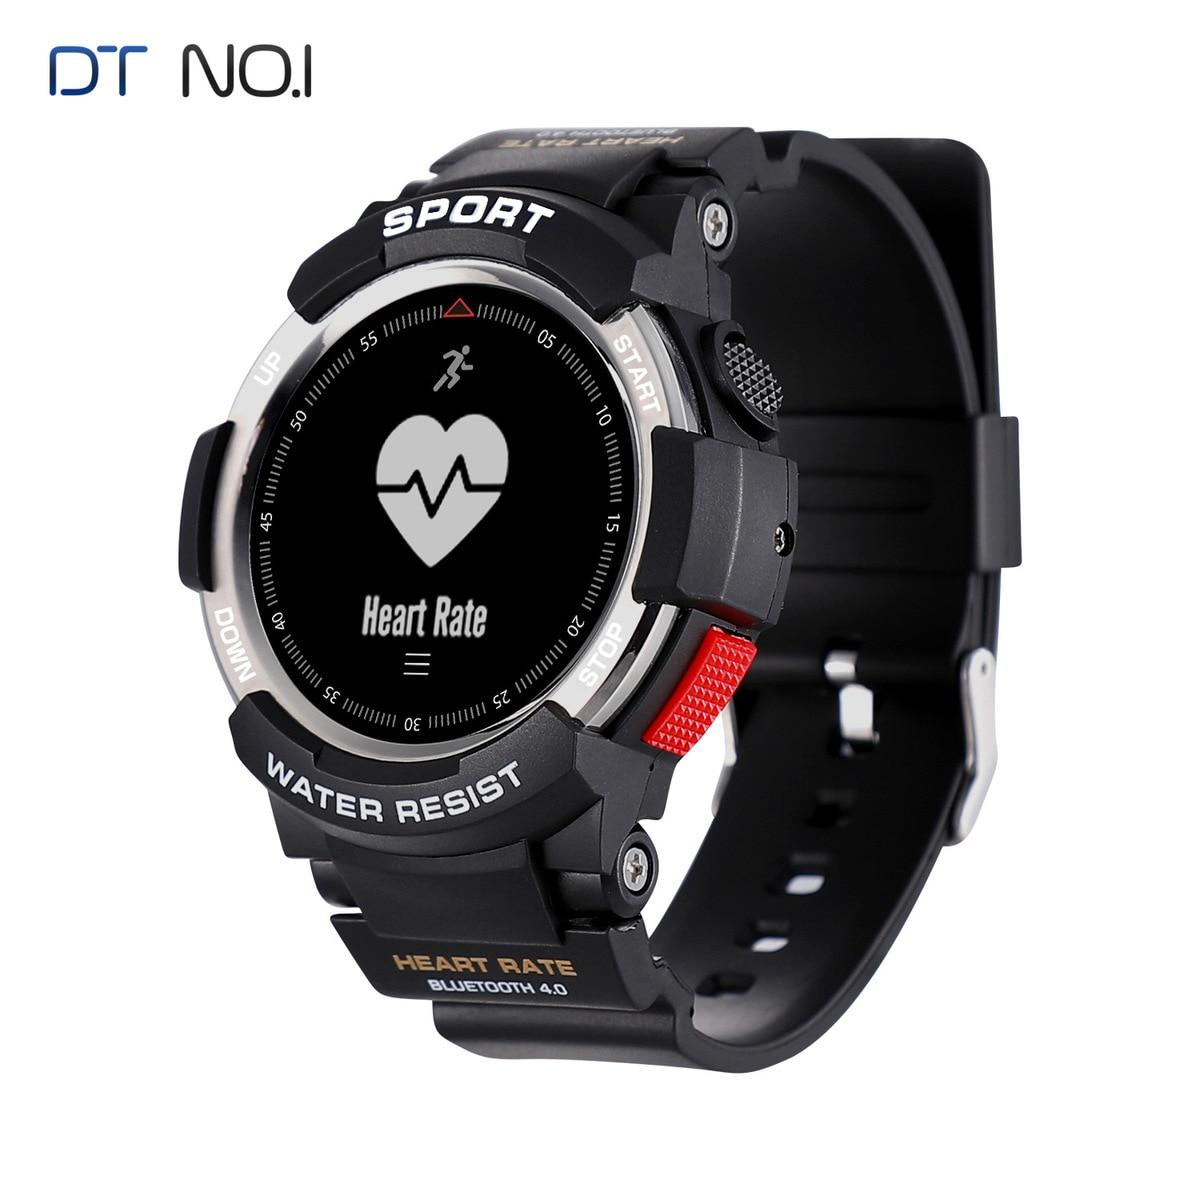 Smart watches F6 Smartwatch Bracelet Outdoor IP68 Multi-sport Watch saat wearable devices relogio inteligente